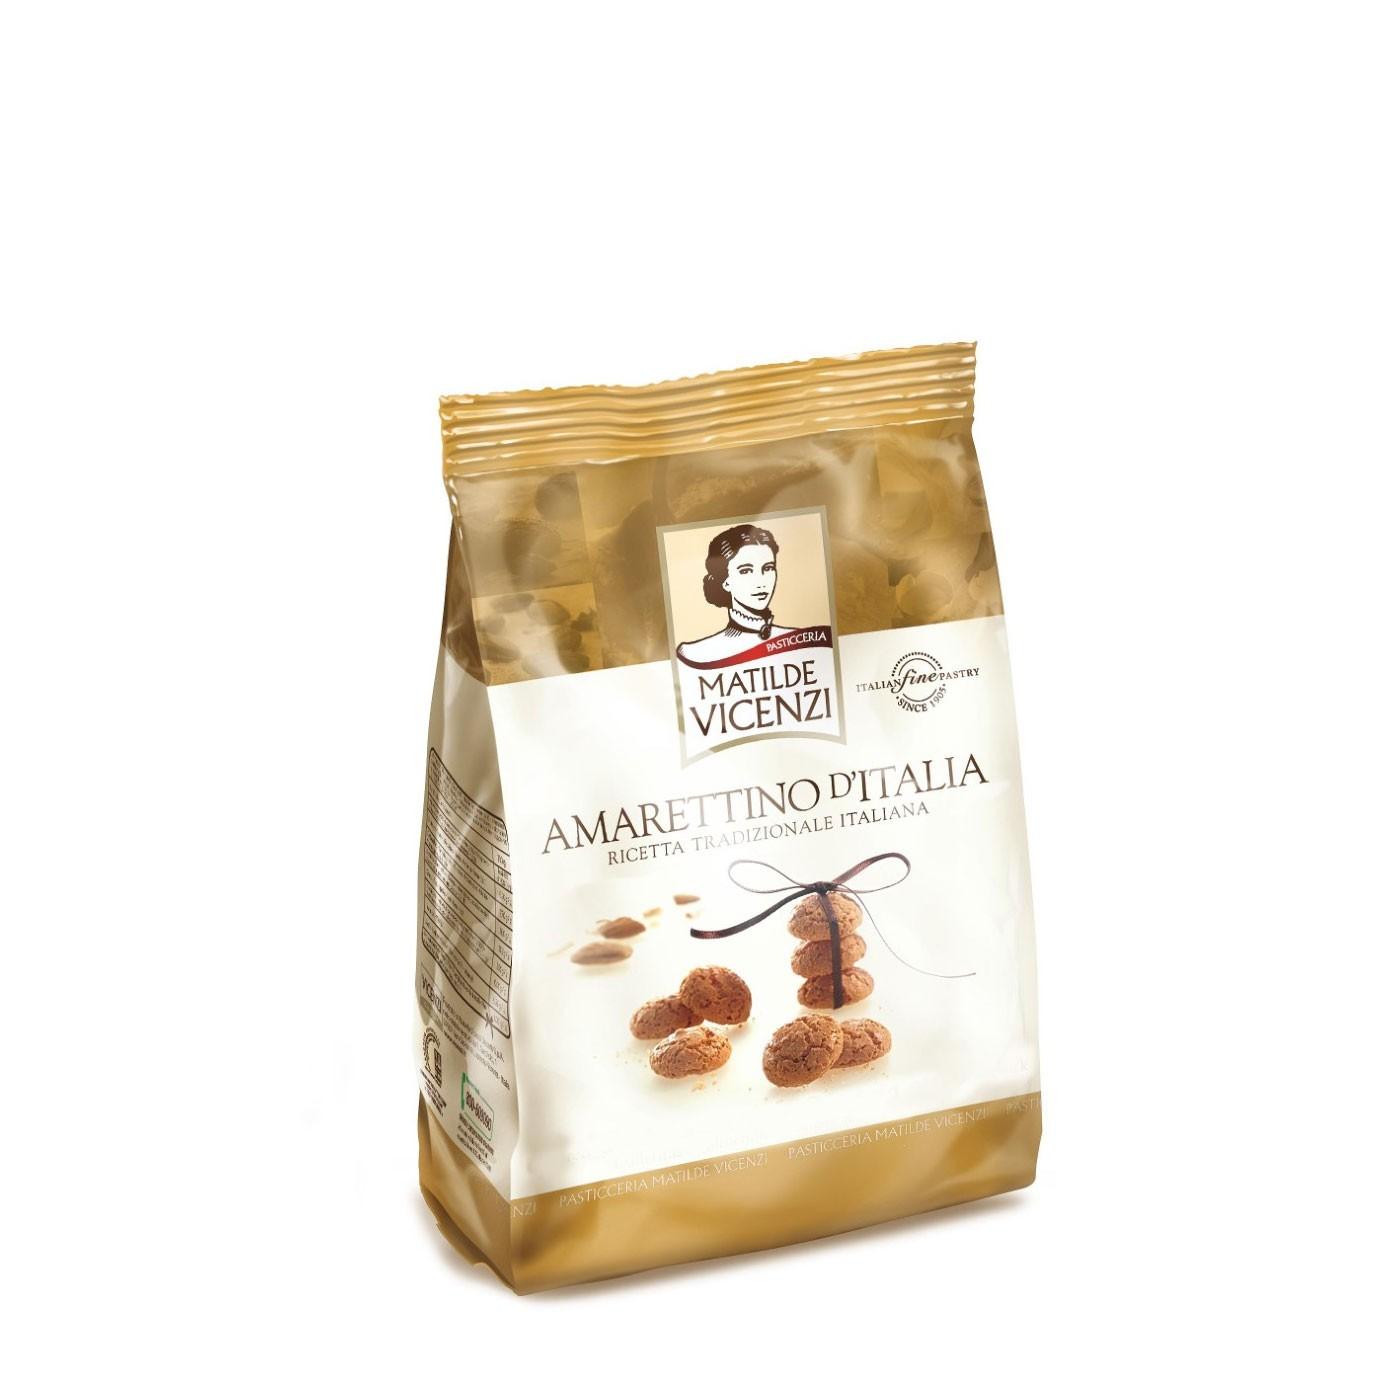 Amaretti Cookies 3.5oz